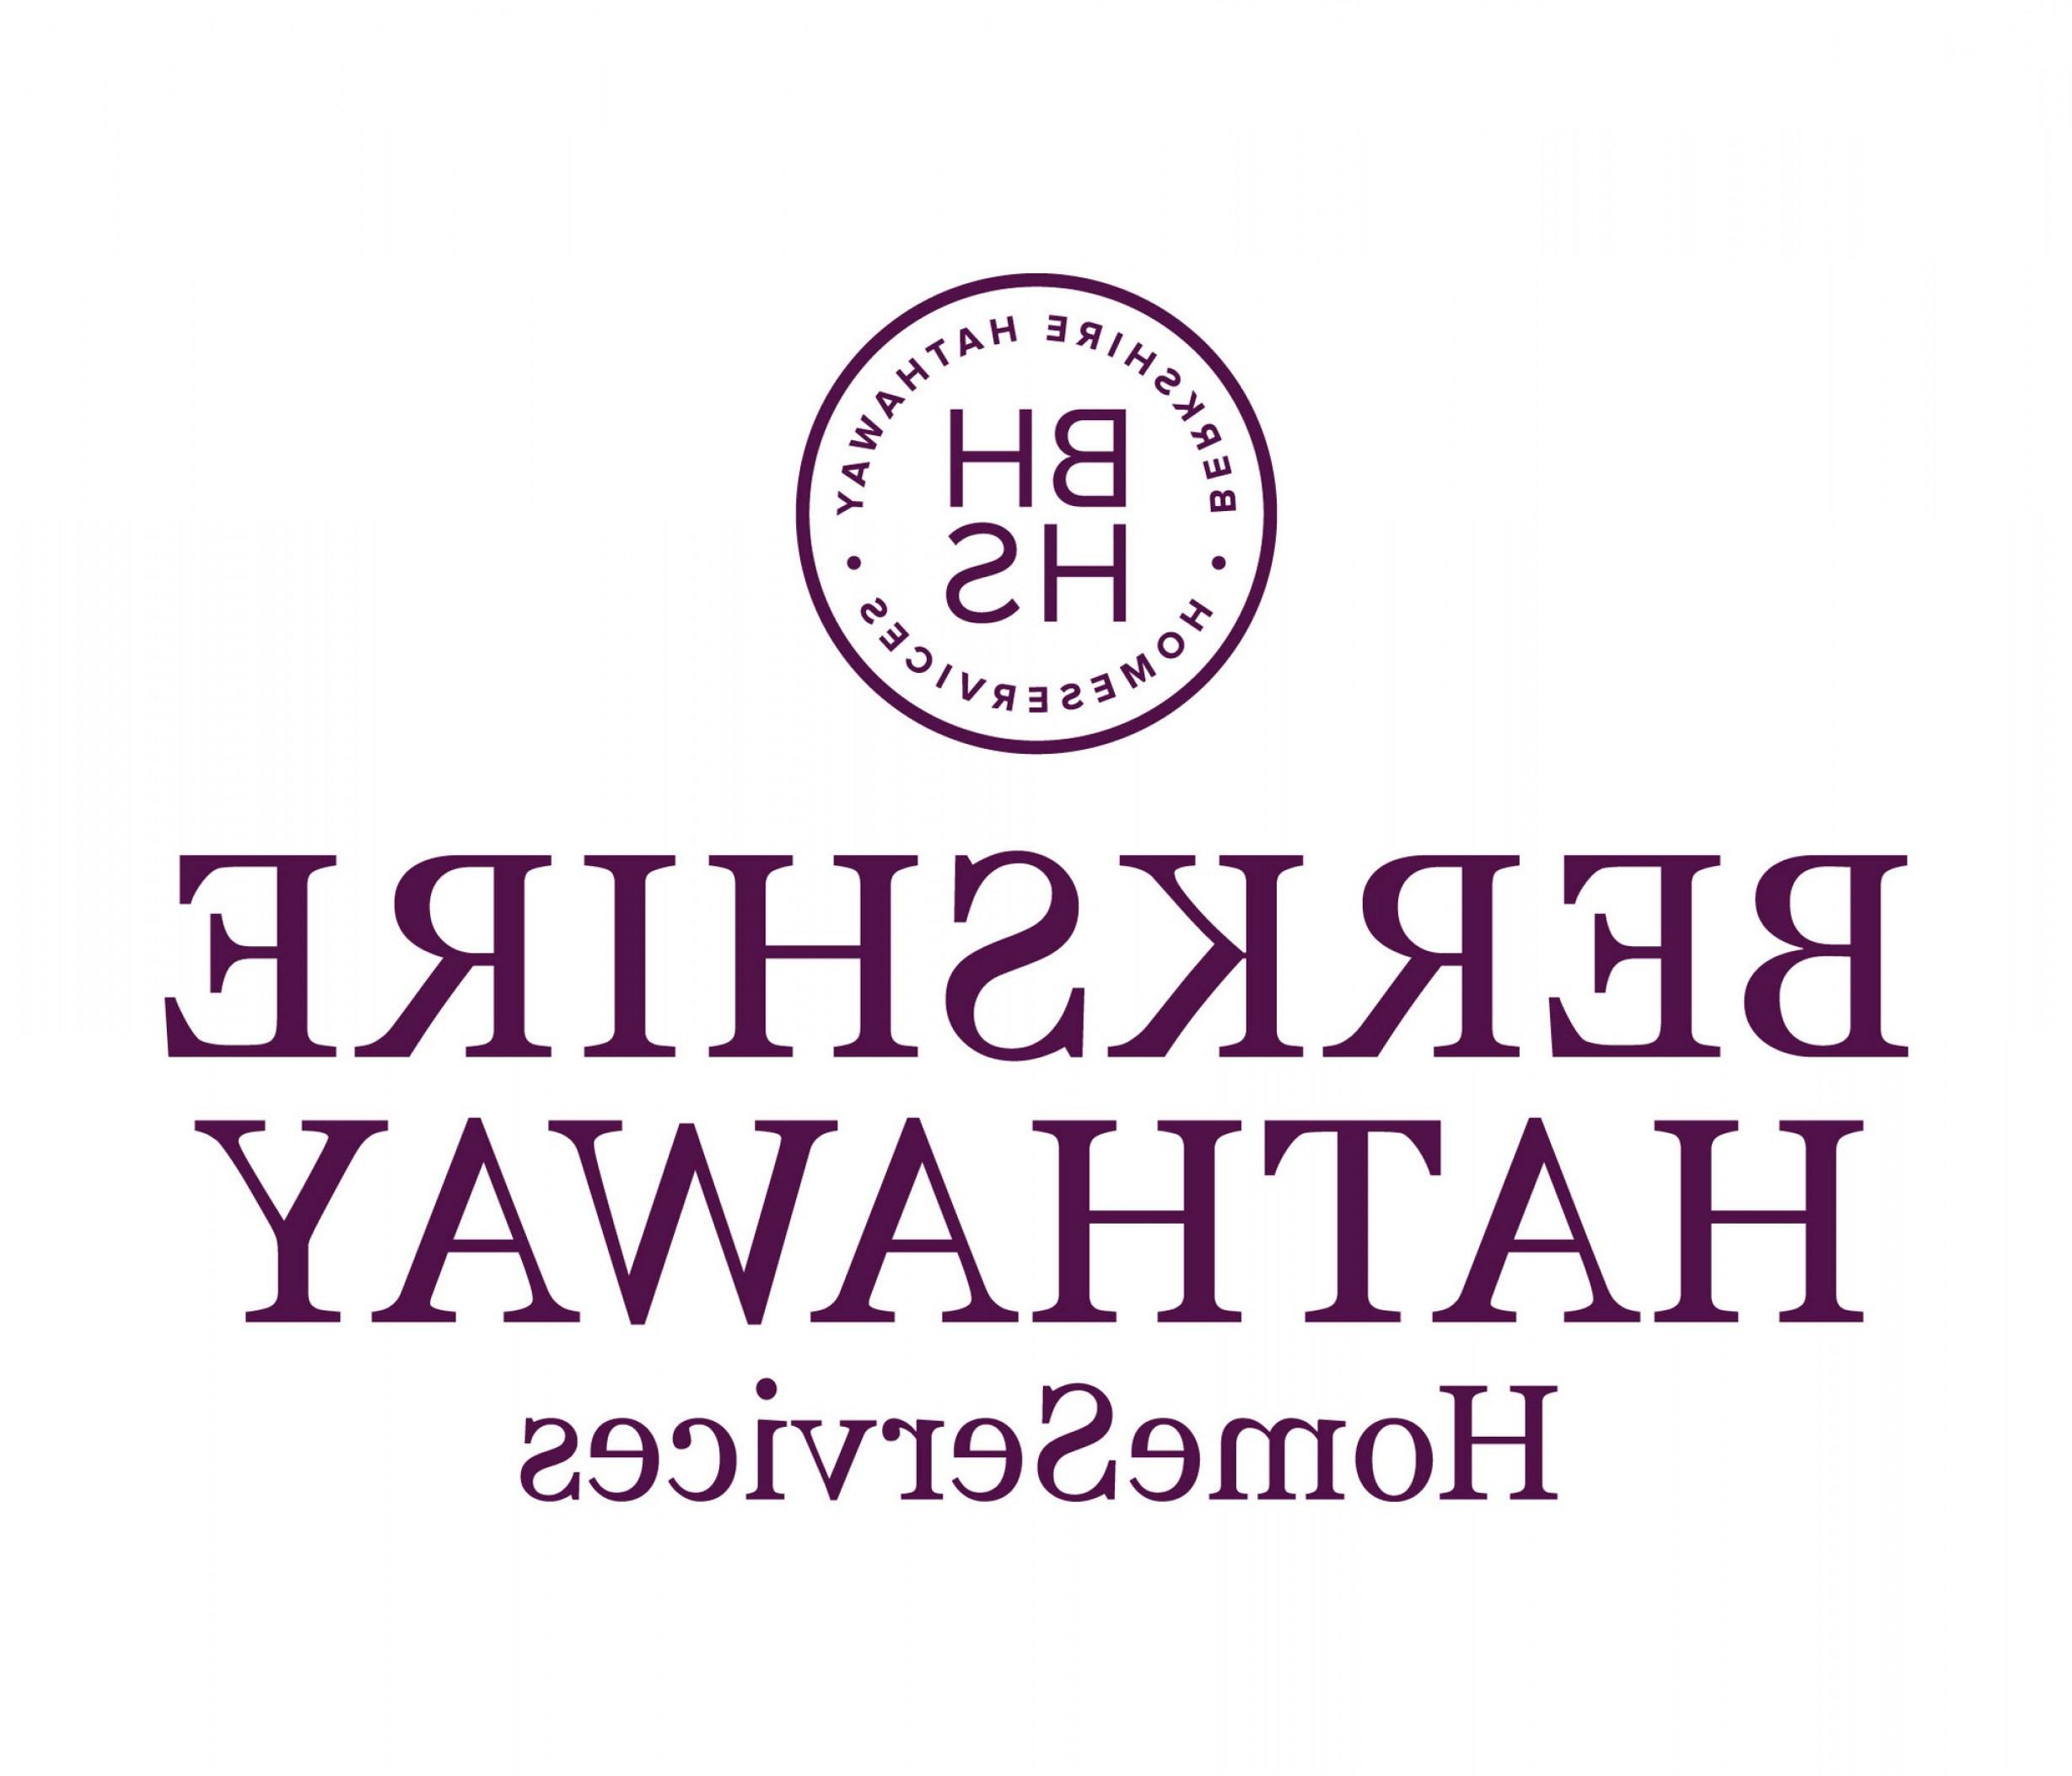 2457x2106 City Of Hope Vector Logo Orangiausa